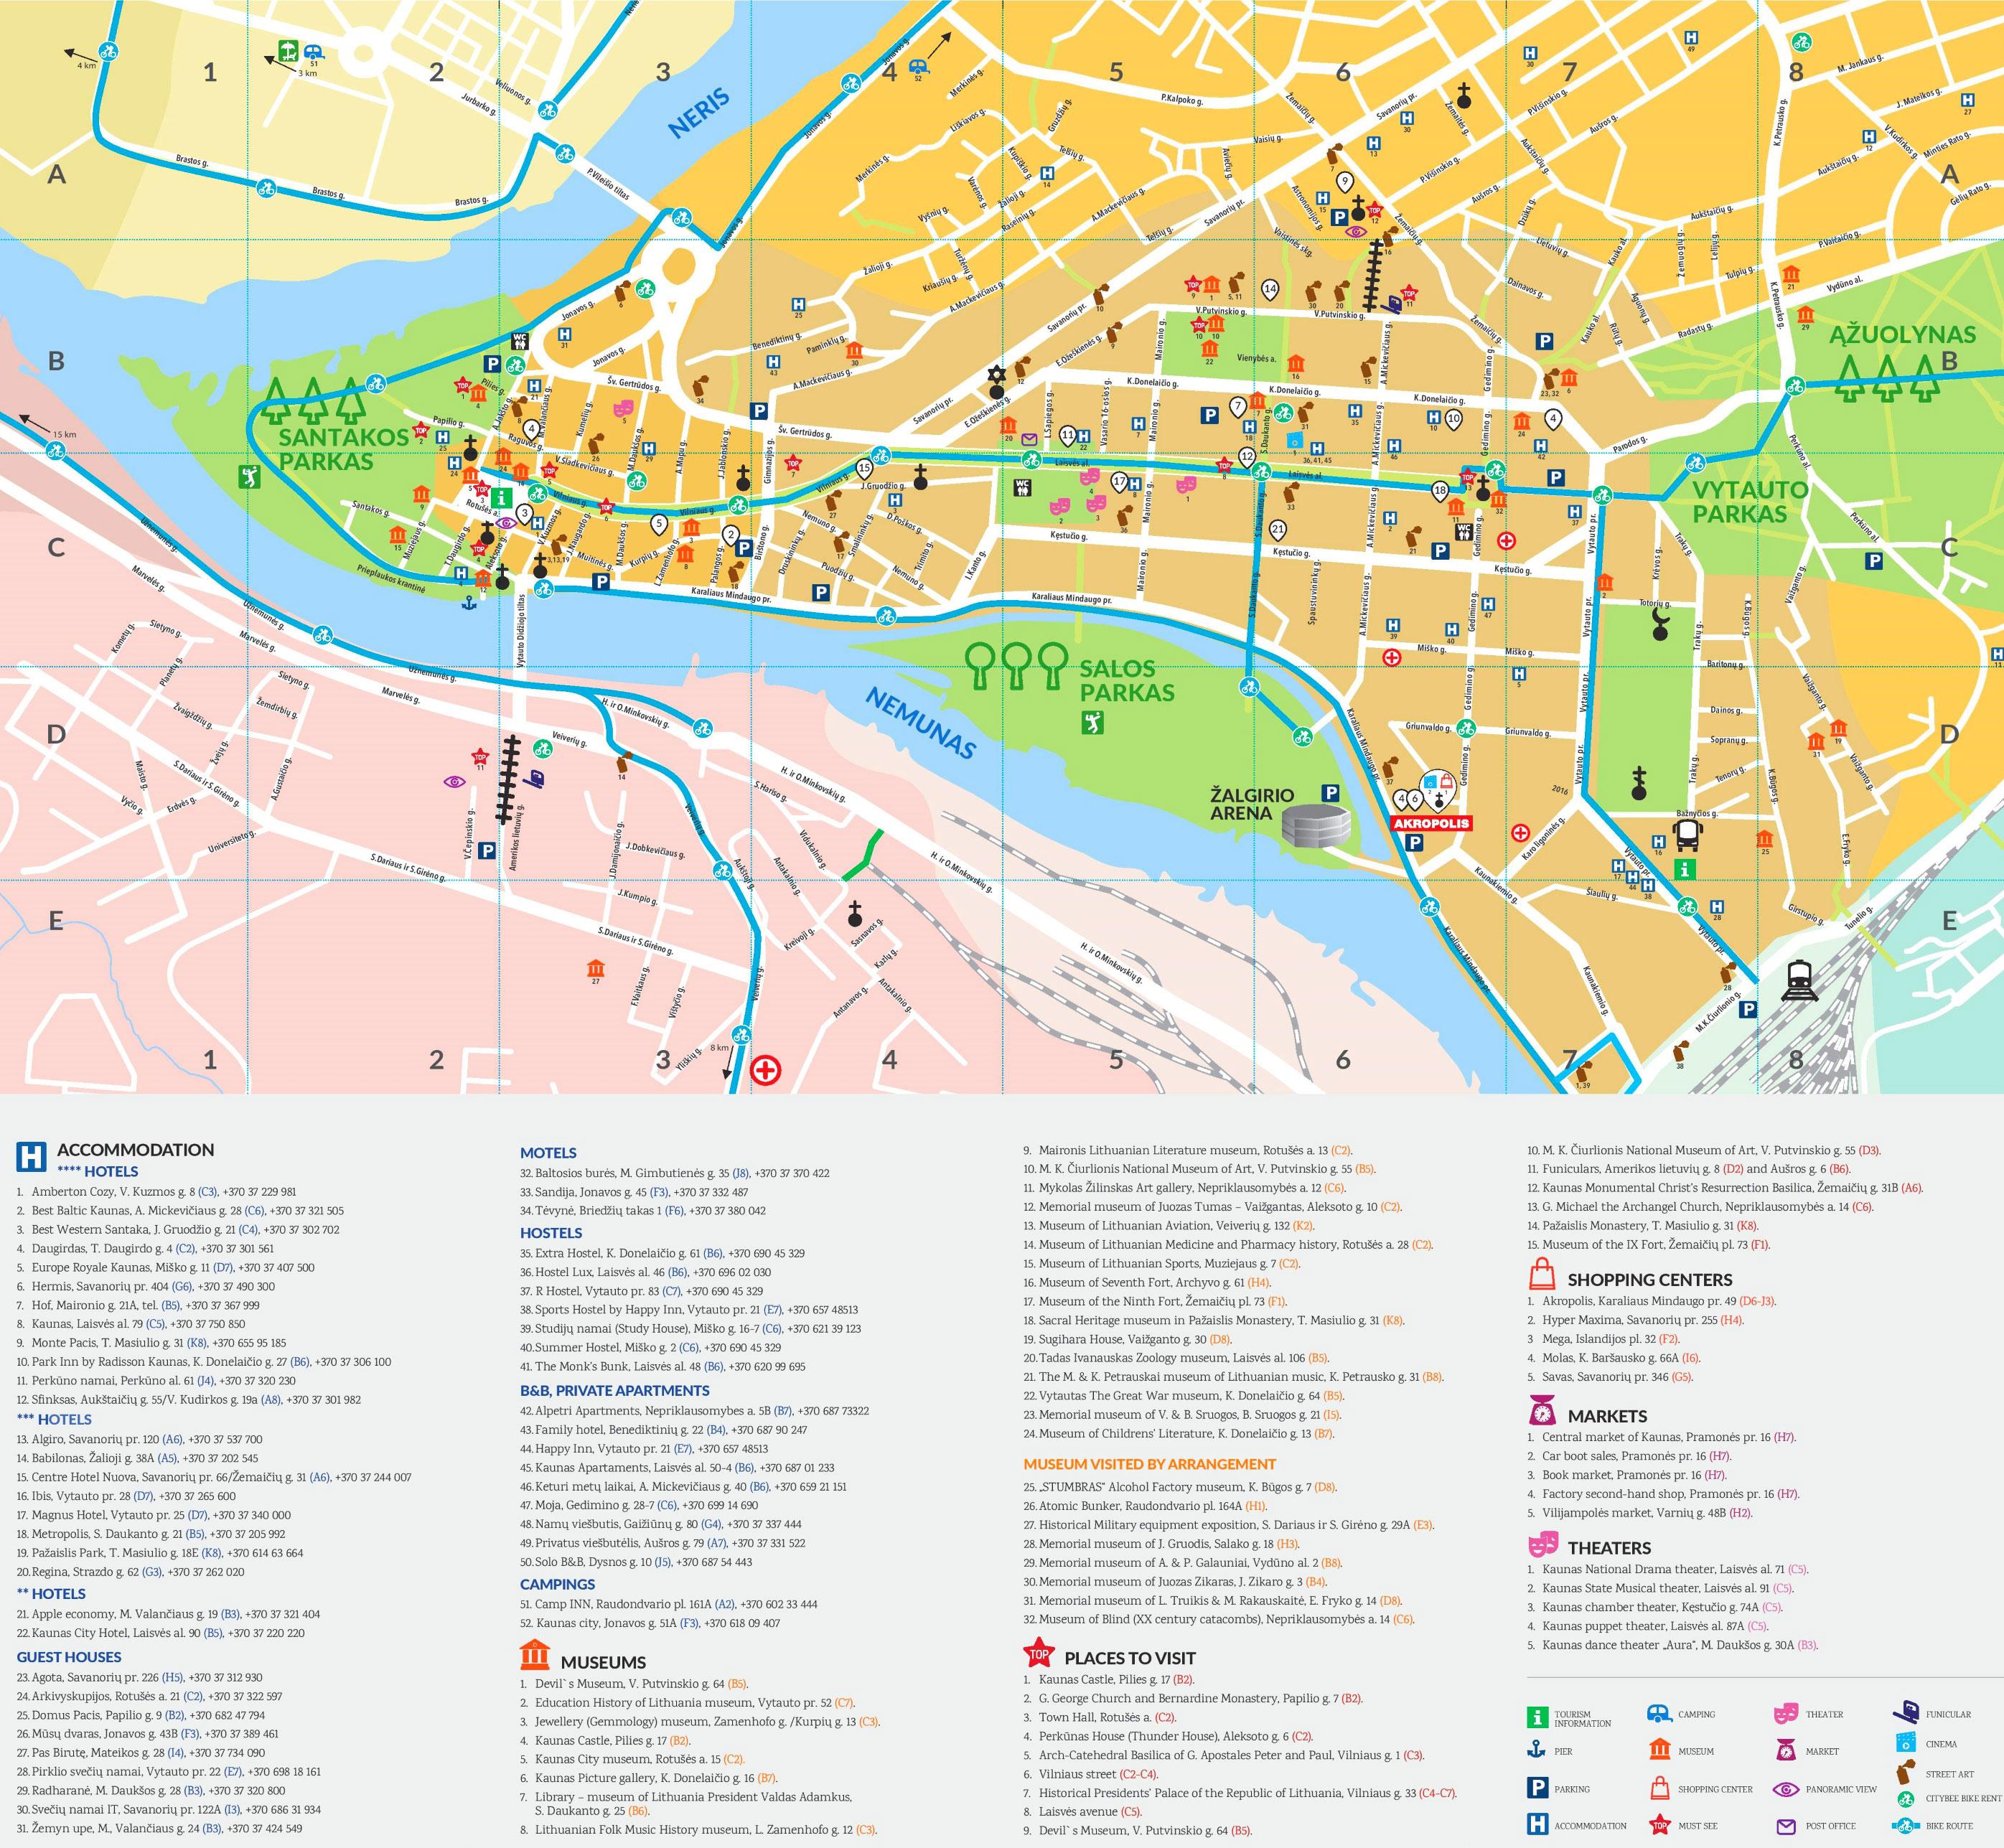 Mapa turístico de Kaunas